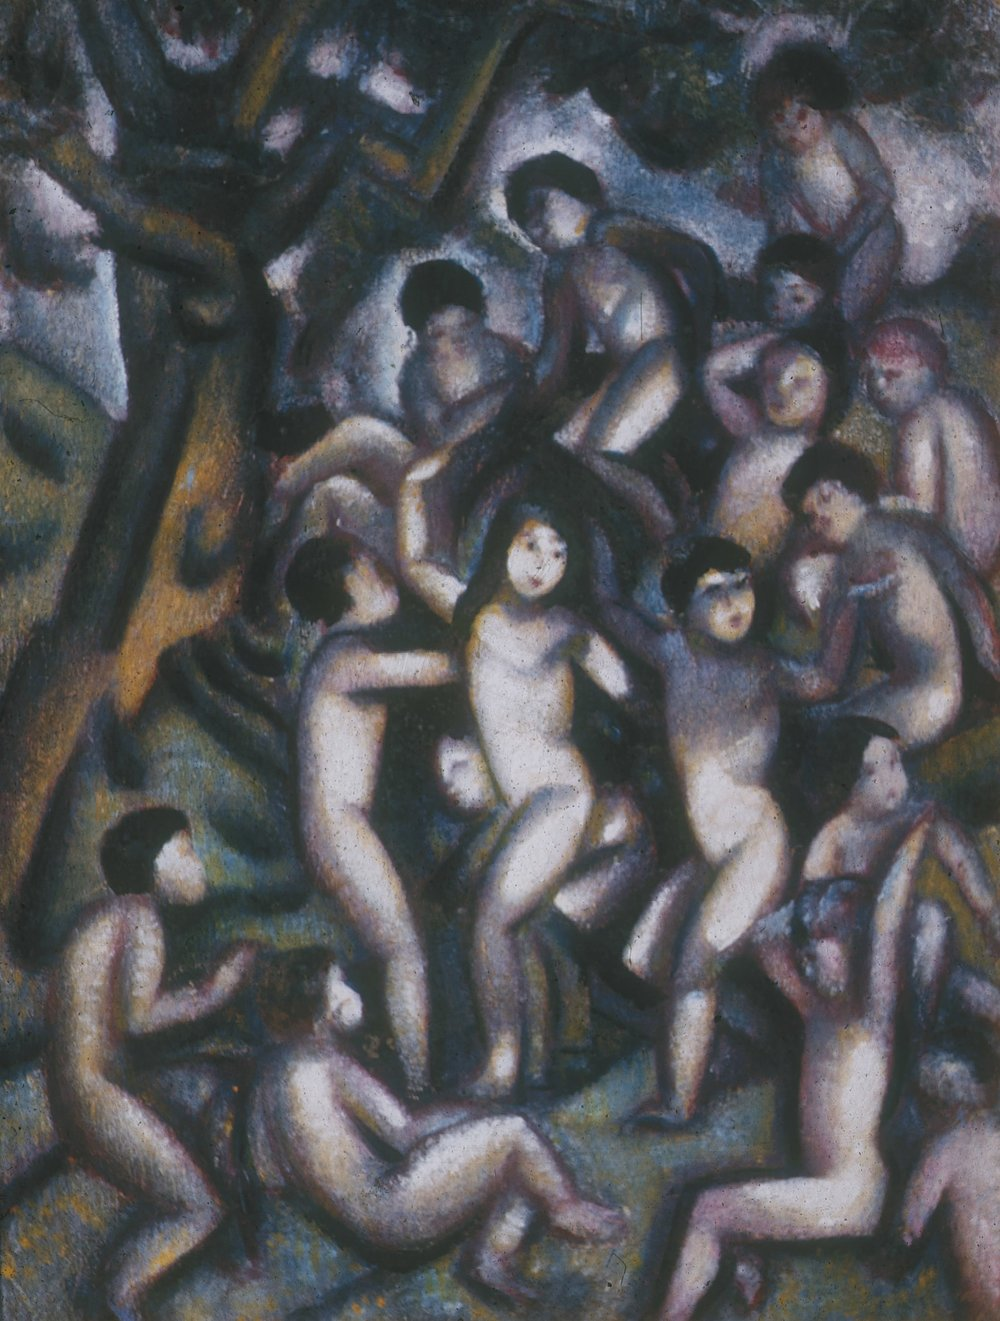 One of Carl Schmitt's imaginative works